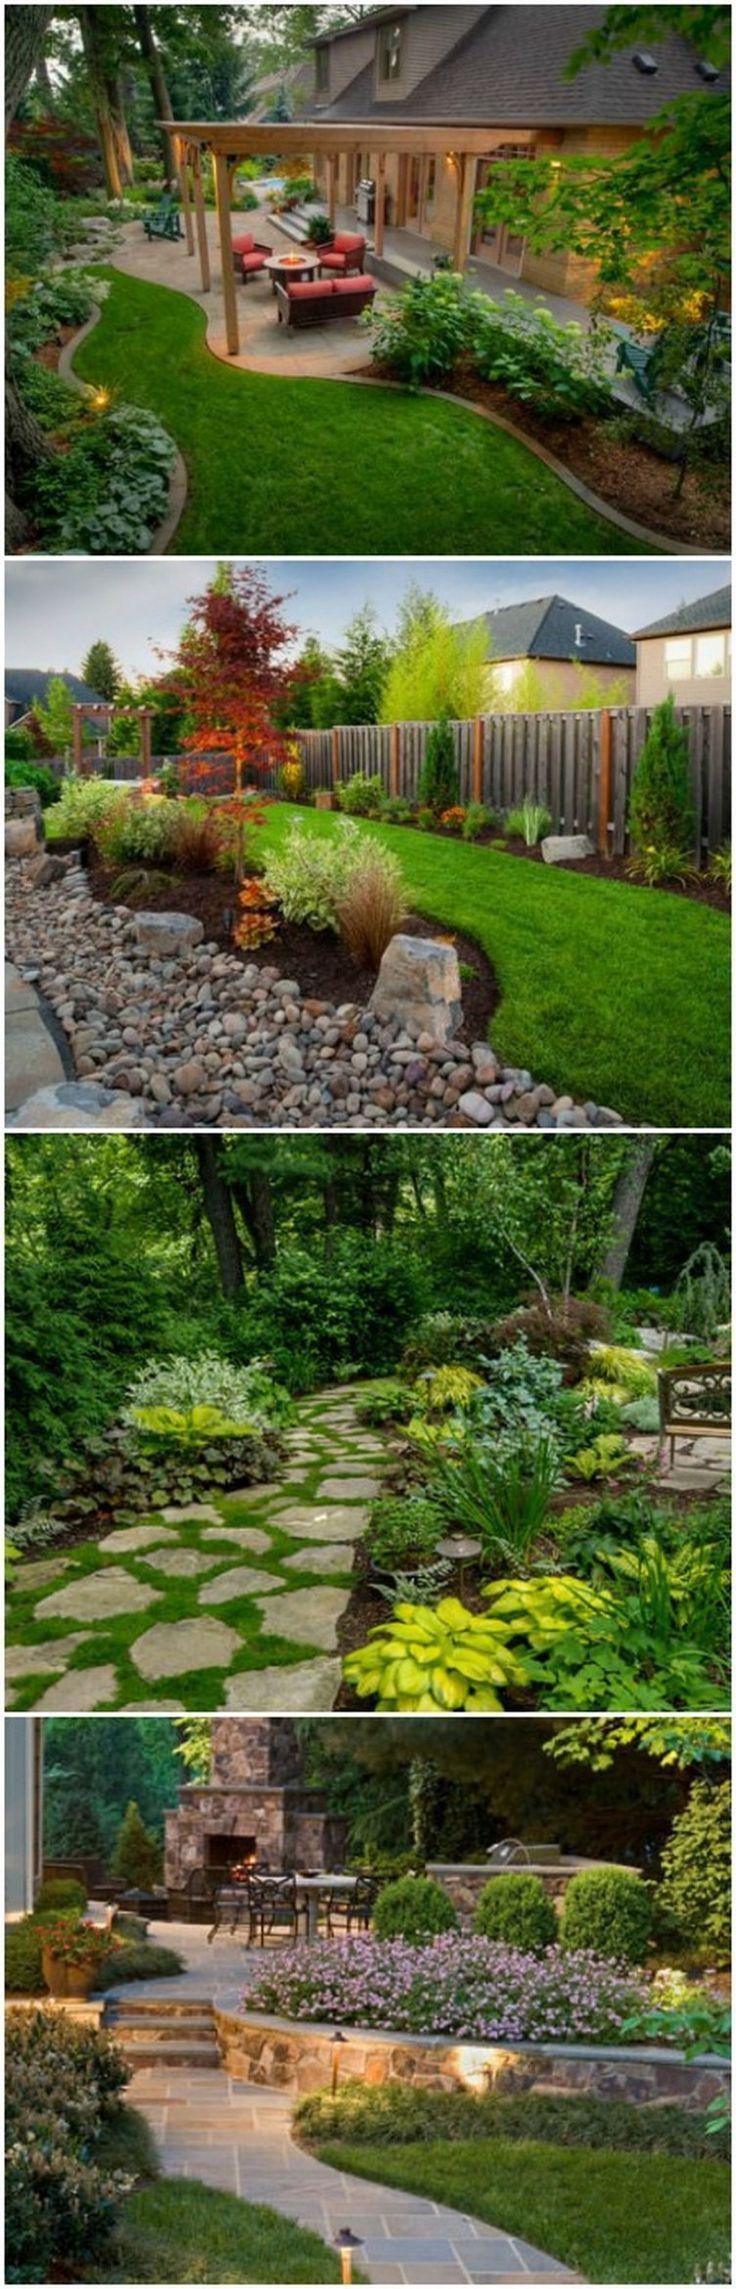 75 Brilliant Backyard Landscaping Design Ideas (14) | Garden and ...